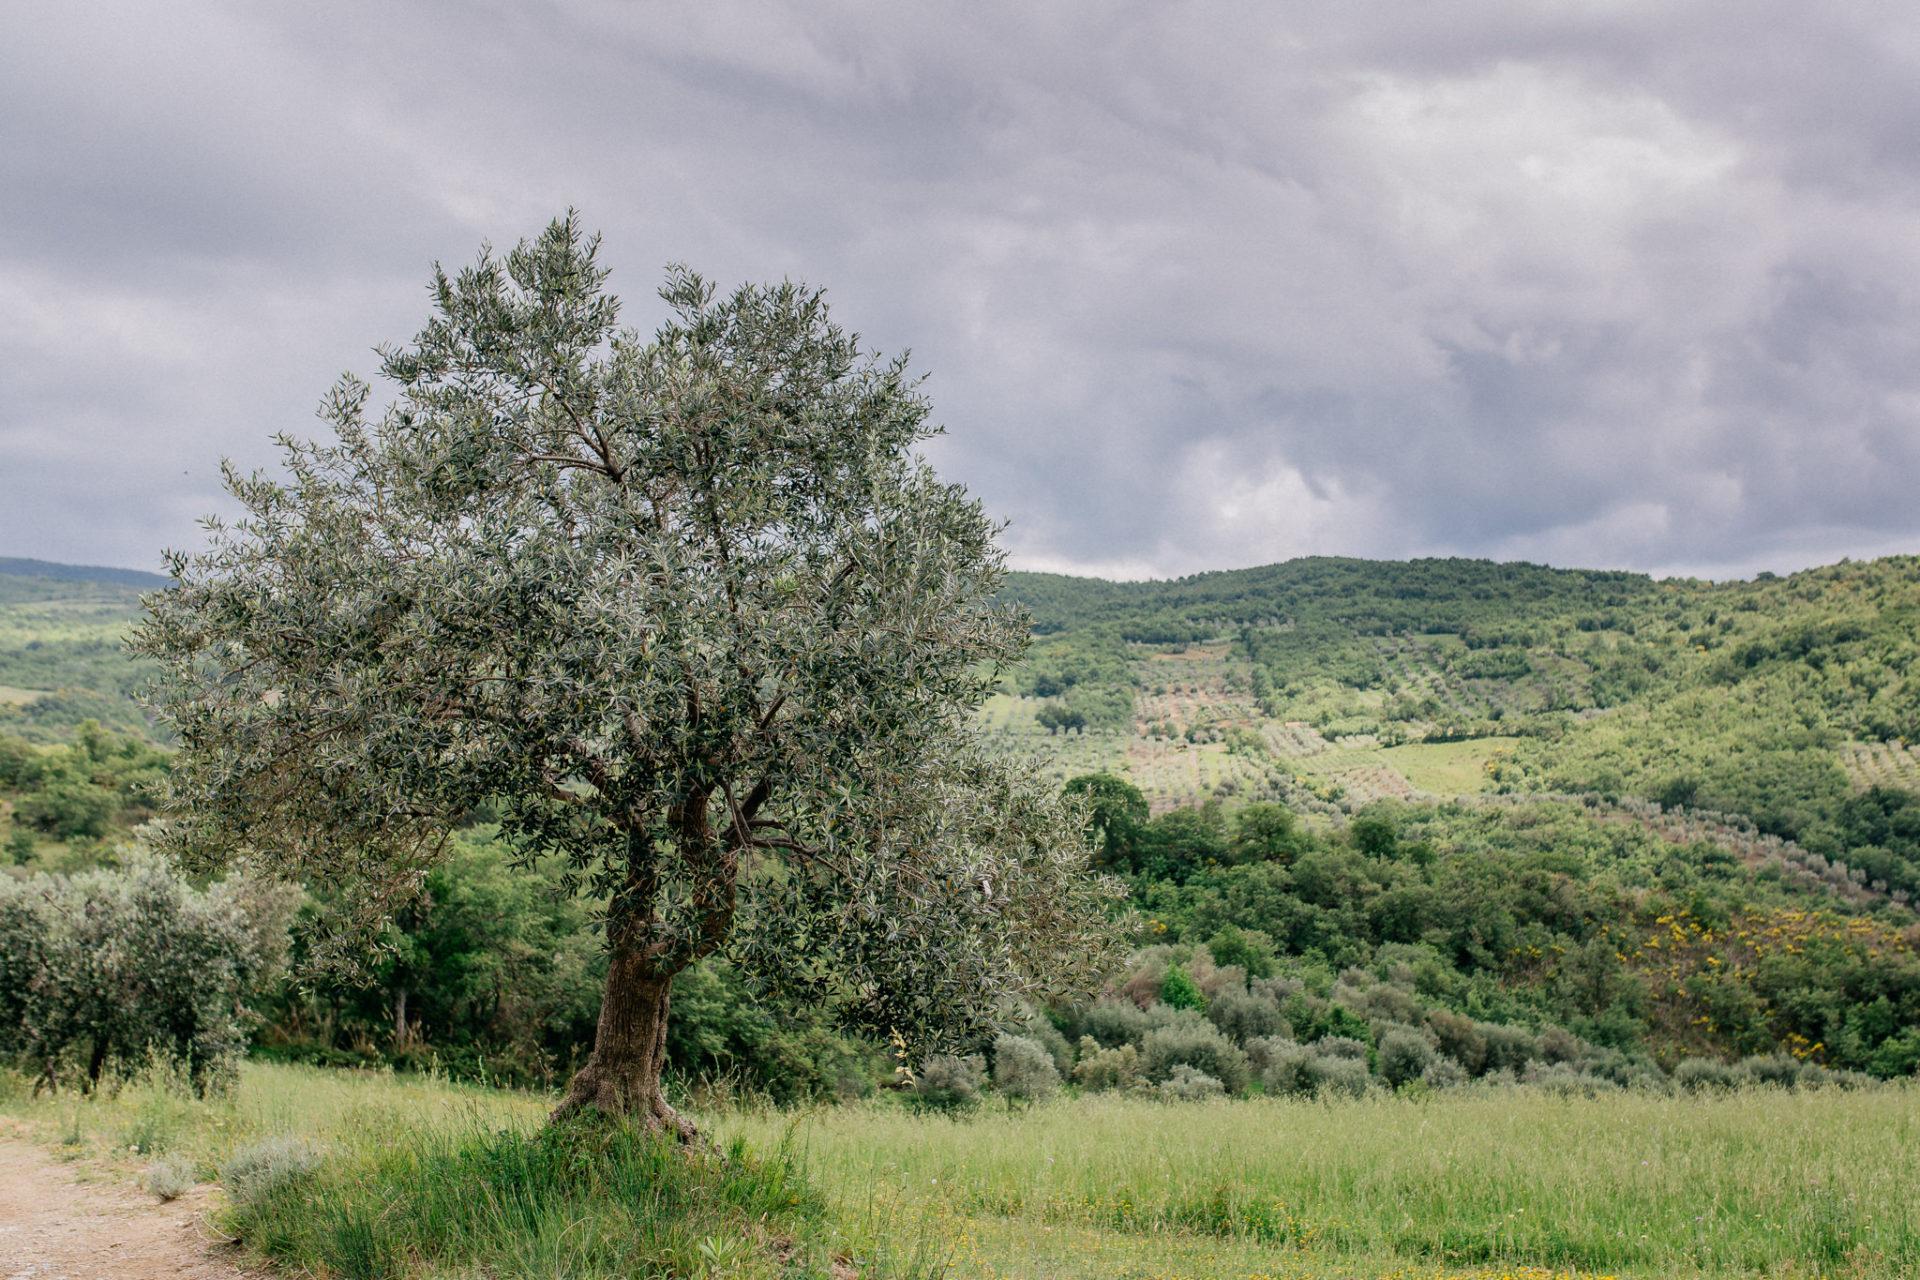 heiraten Toskana-hochzeitsfotograf toskana-italien roadtrip-europa entdecken-olivenhaine-natur genießen-italien wandern